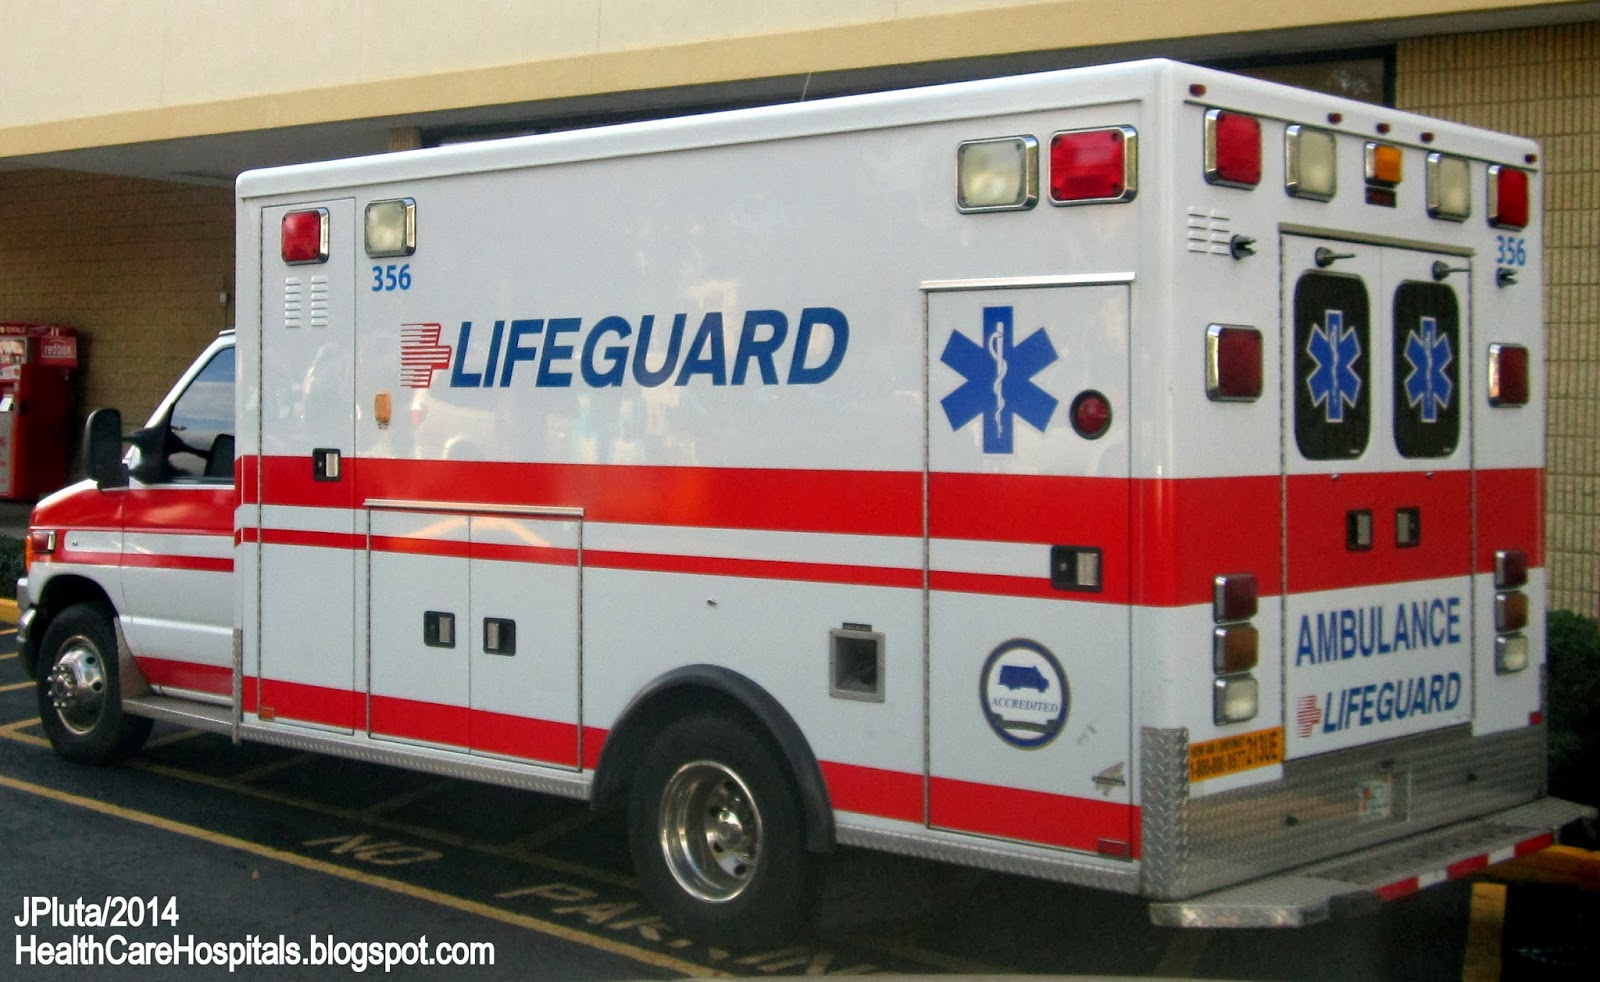 http://3.bp.blogspot.com/-tcRl6z9lZz0/UsdZh2WqeyI/AAAAAAAGdA4/wXMDxZ4UPU8/s1600/LIFEGUARD+AMBULANCE+Columbia+County,+Lake+City+Florida+Division,+Life+Guard+GMC+Ambulance+Non+Emergency+Medical+Services+Lake+City+FL..JPG